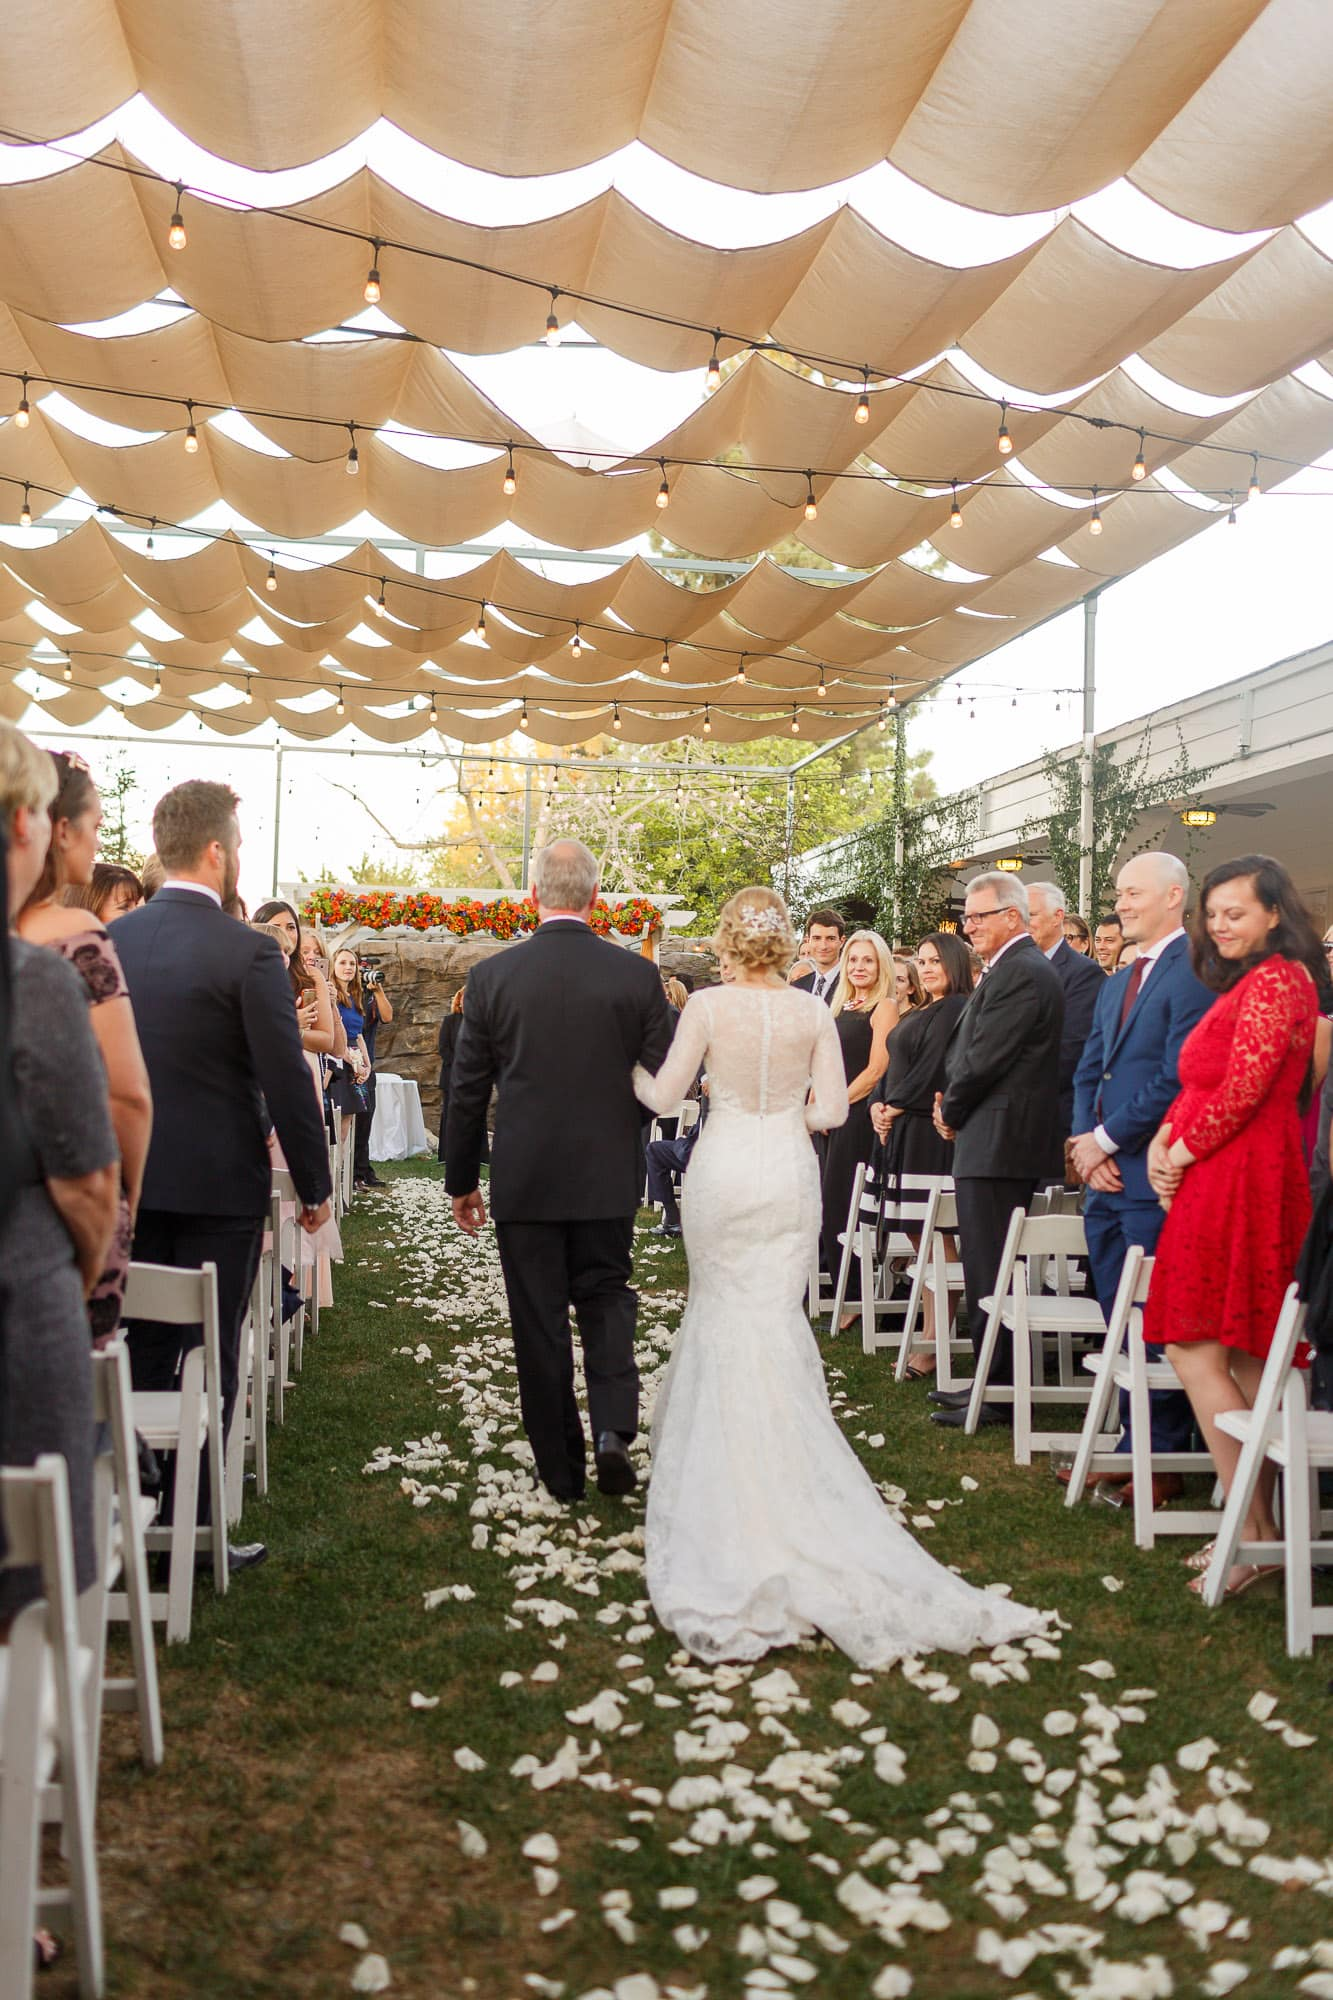 041_Alan_and_Heidi_Los_Angeles_Equestrian_Center_Wedding